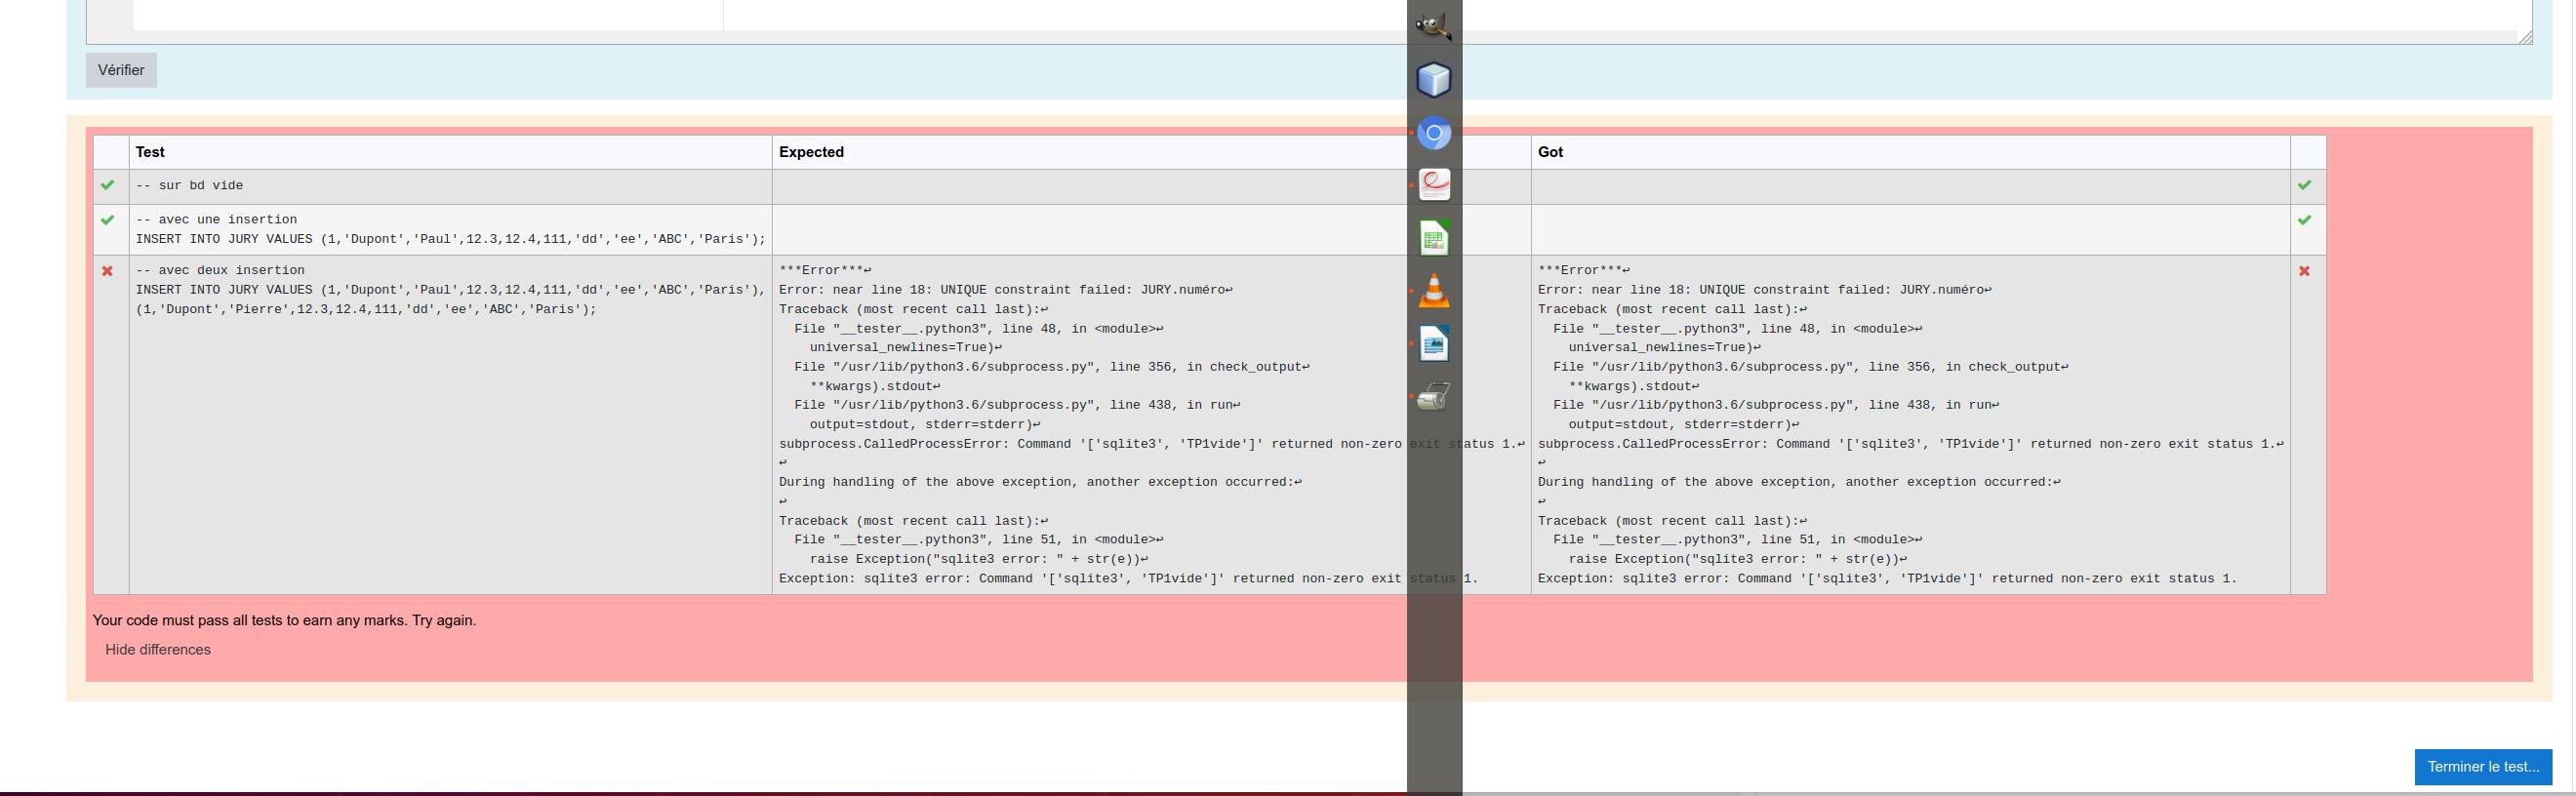 Attachment CodeRunnerSQL.png